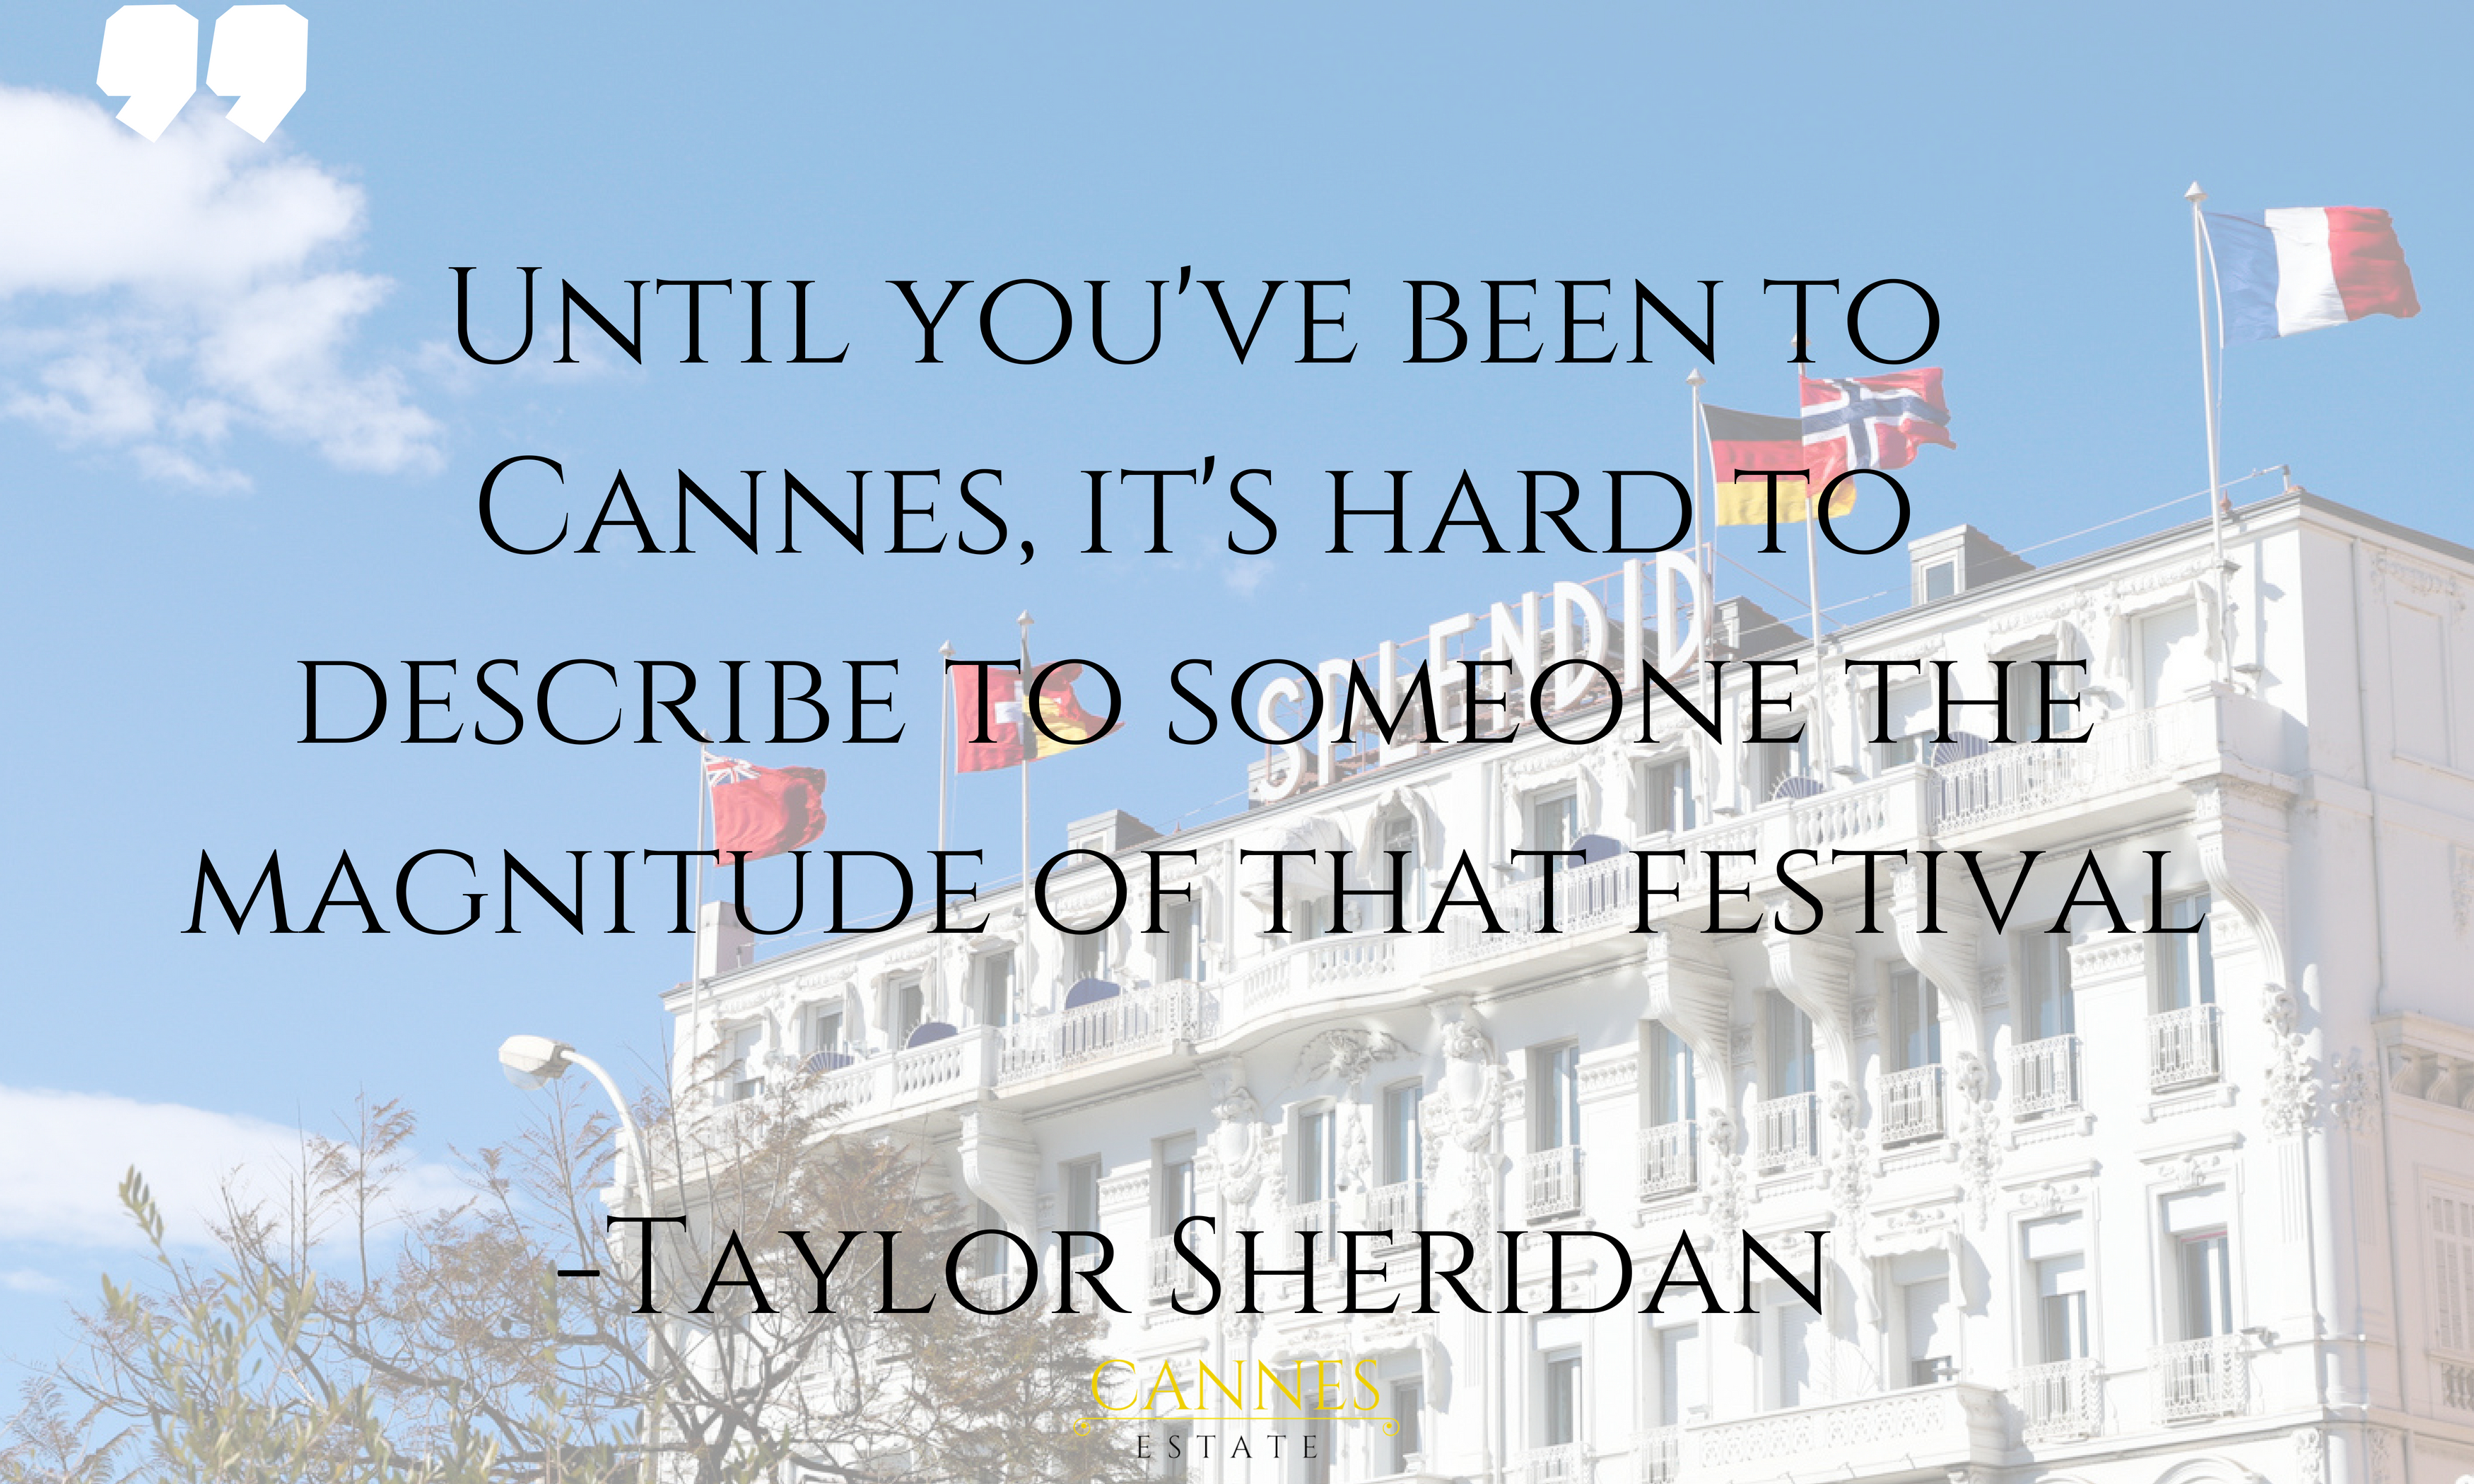 Cannes film festival quote